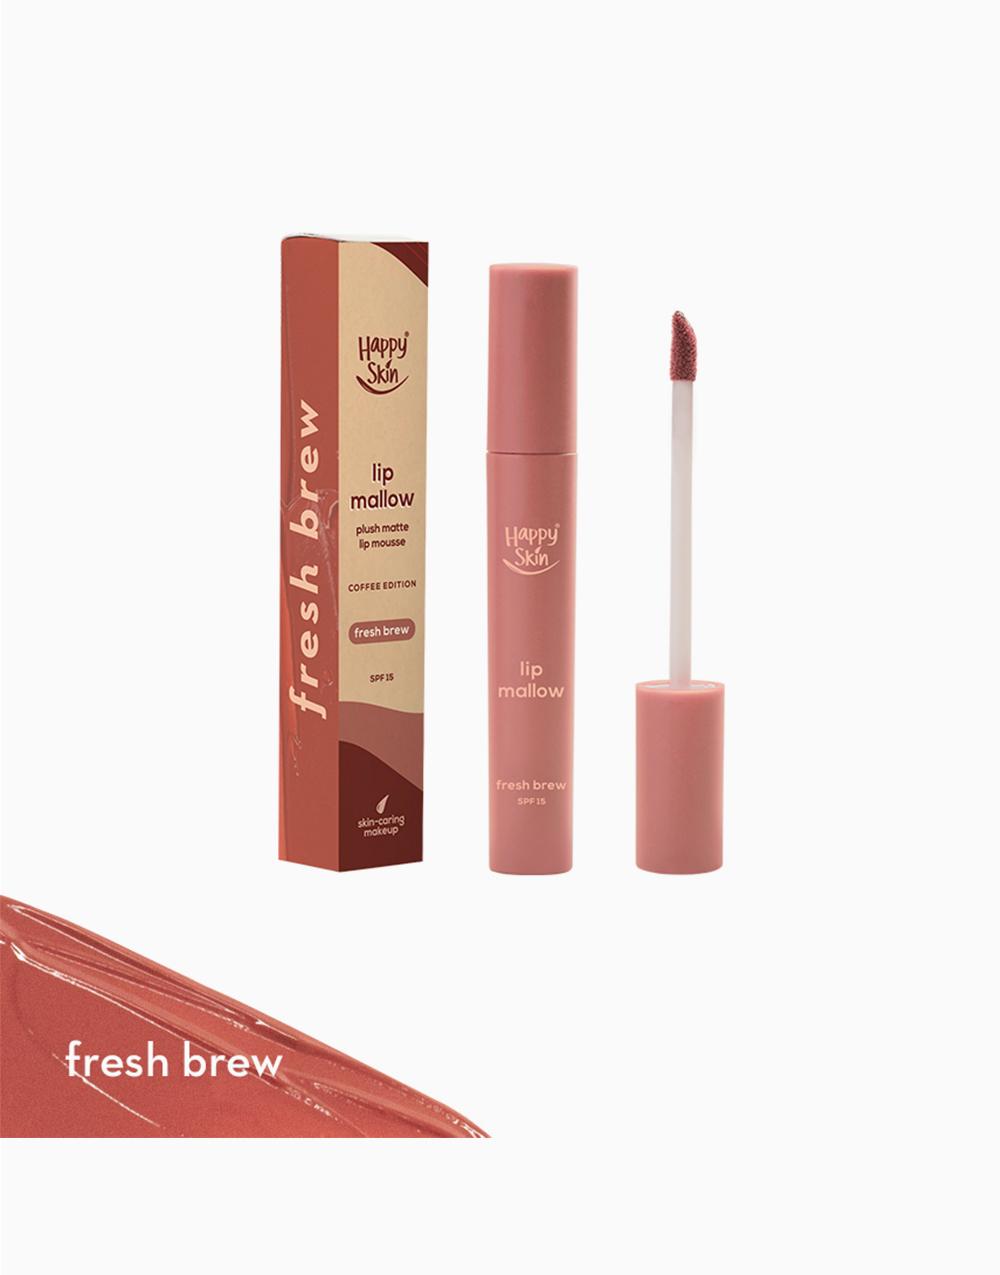 Lip Mallow Mousse by Happy Skin | Fresh Brew